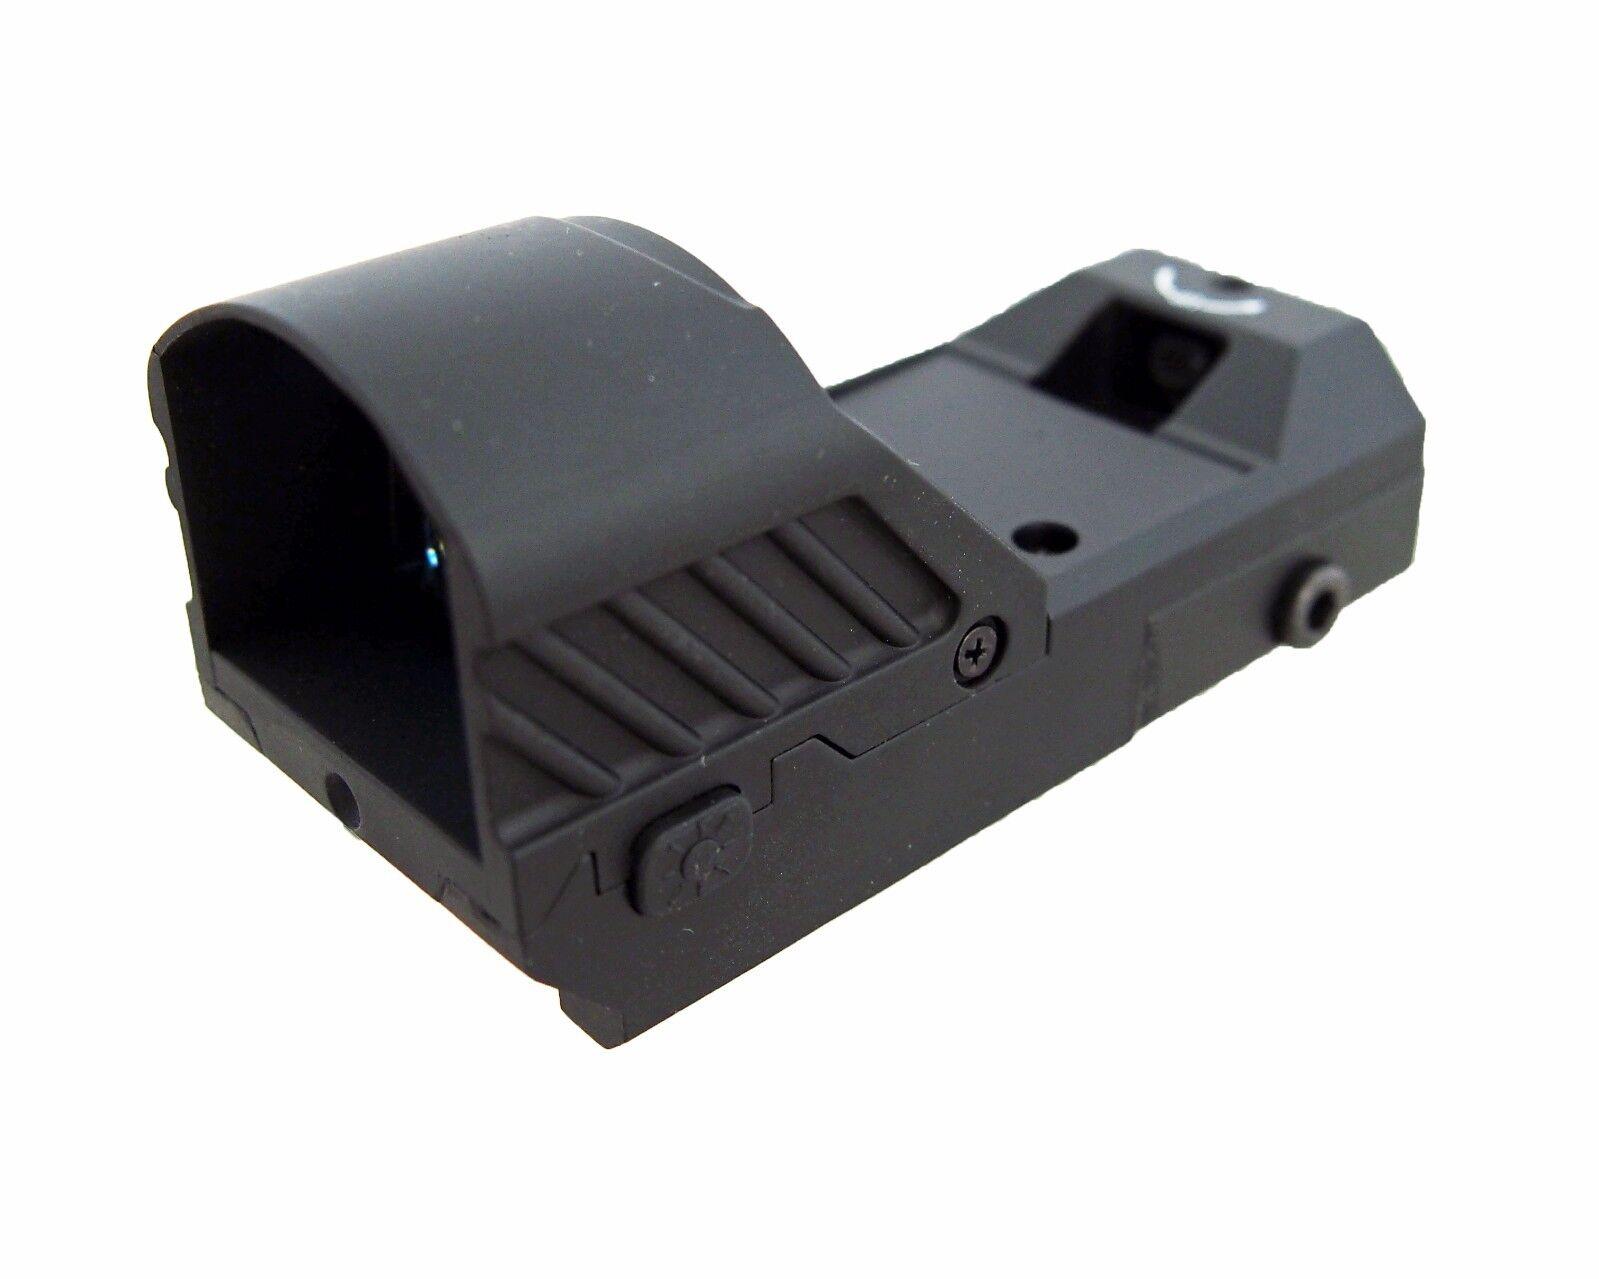 DLP Tactical Push Button Adjustable Brightness Miniature ROT Dot Sight